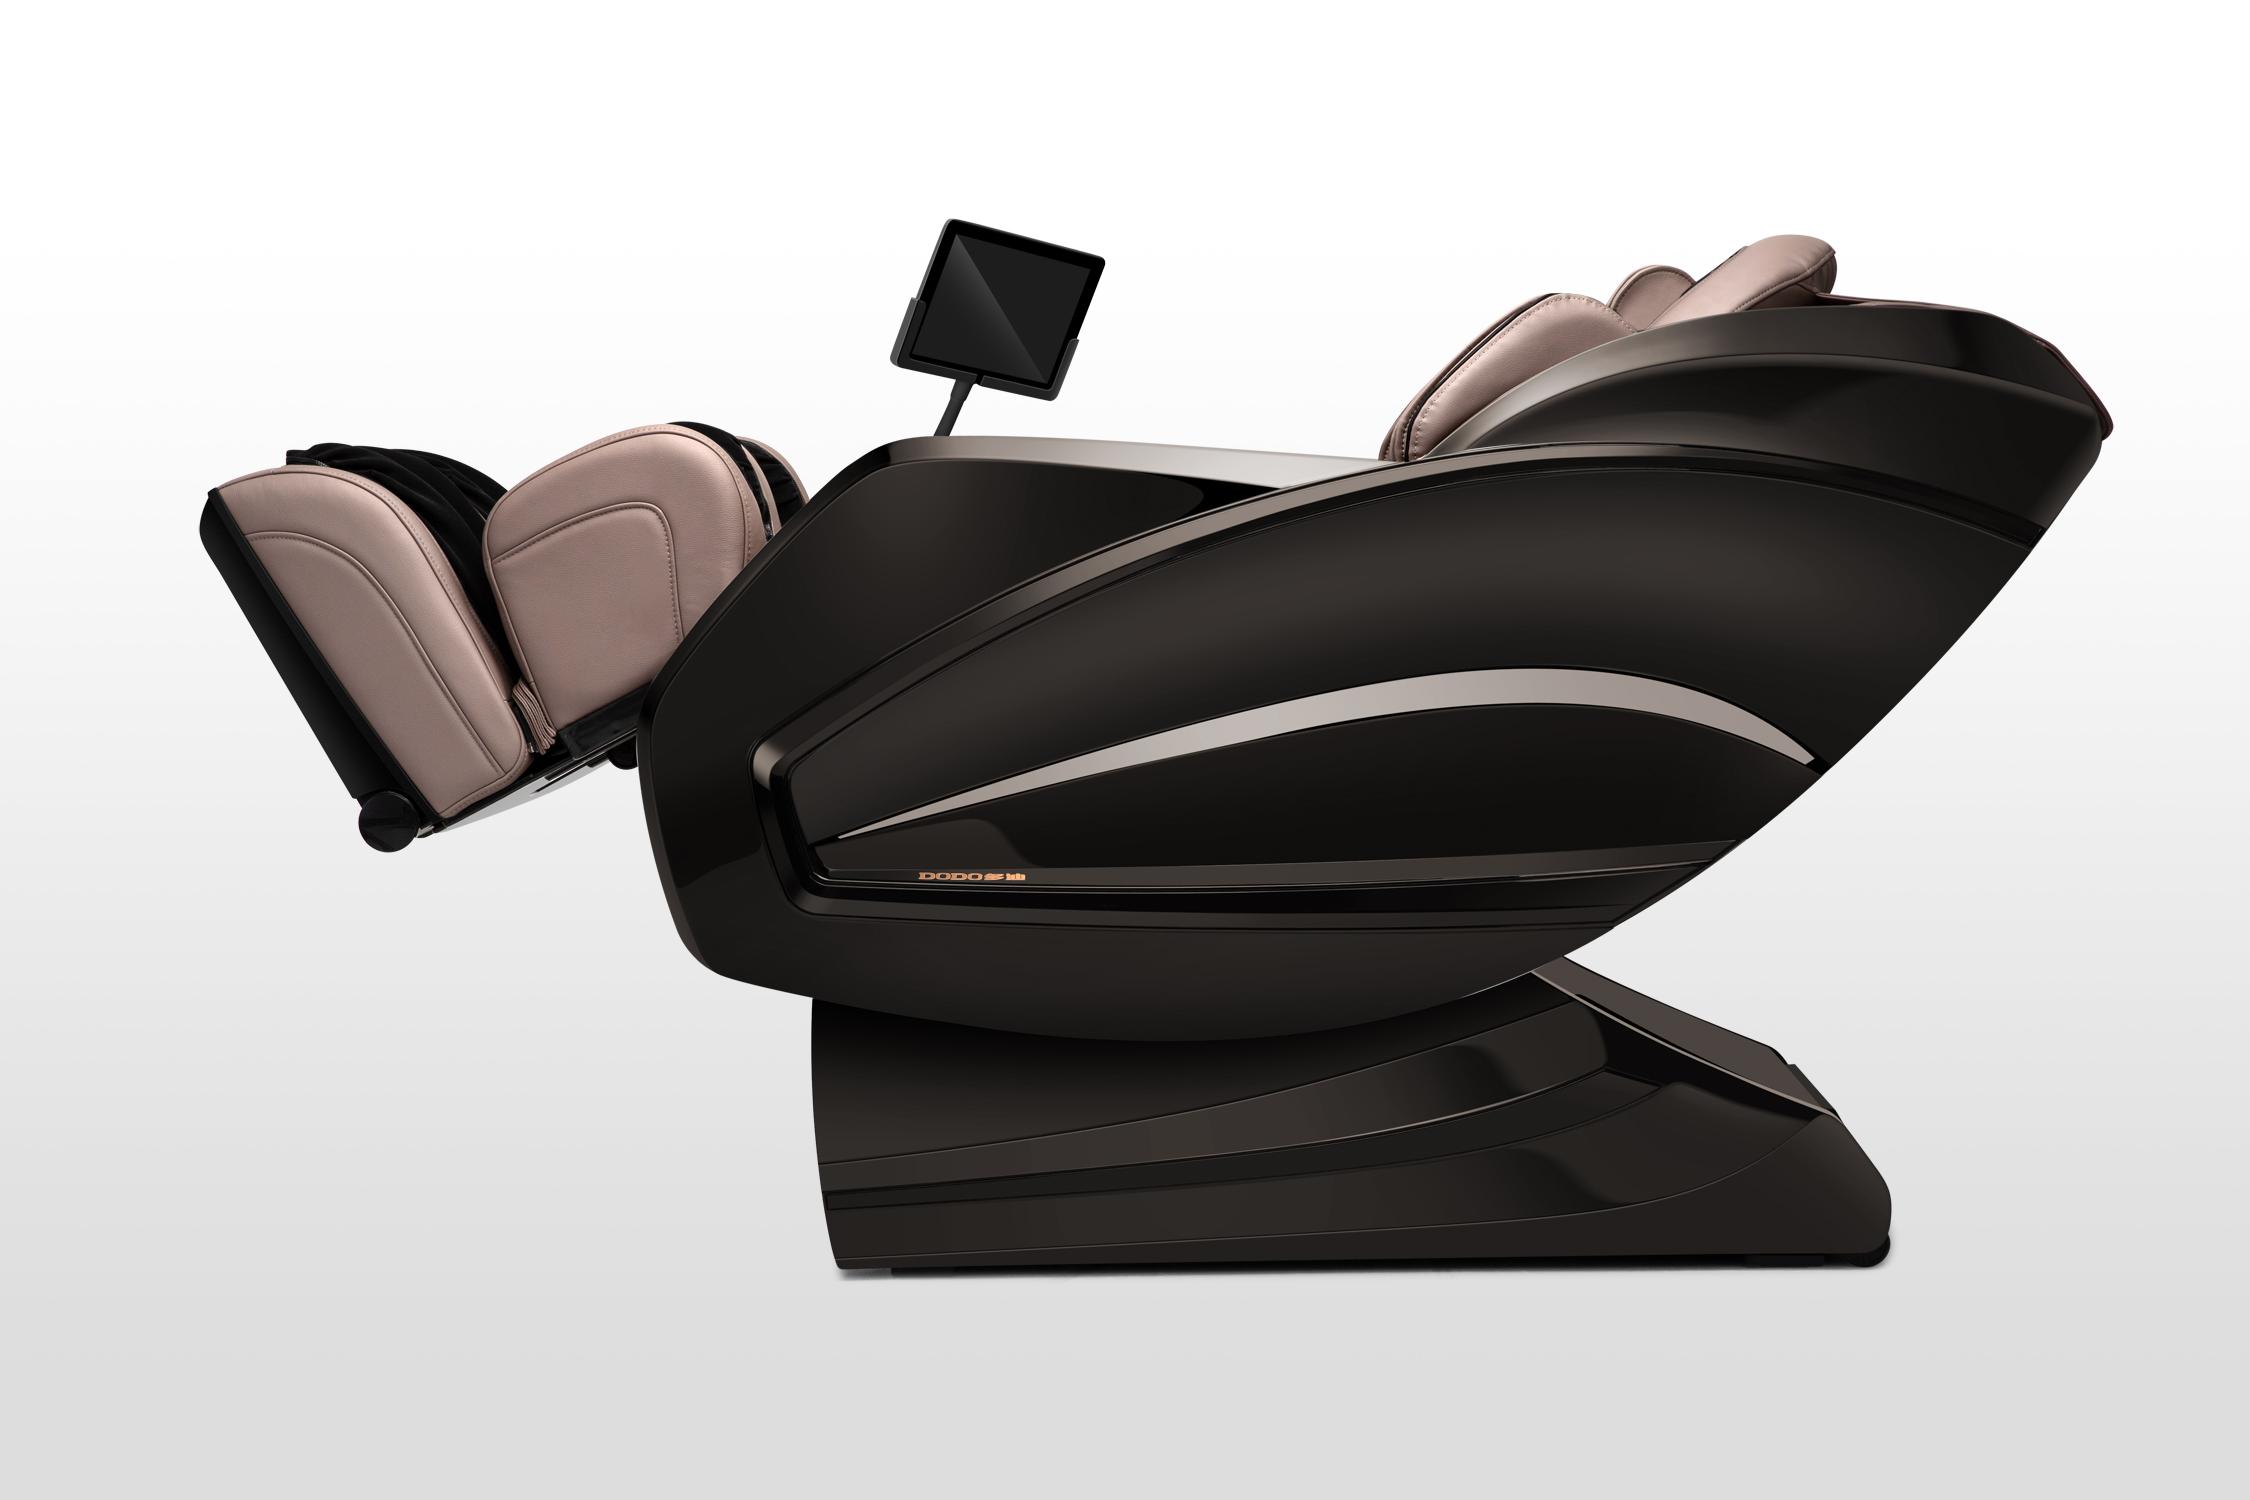 多迪——按摩椅